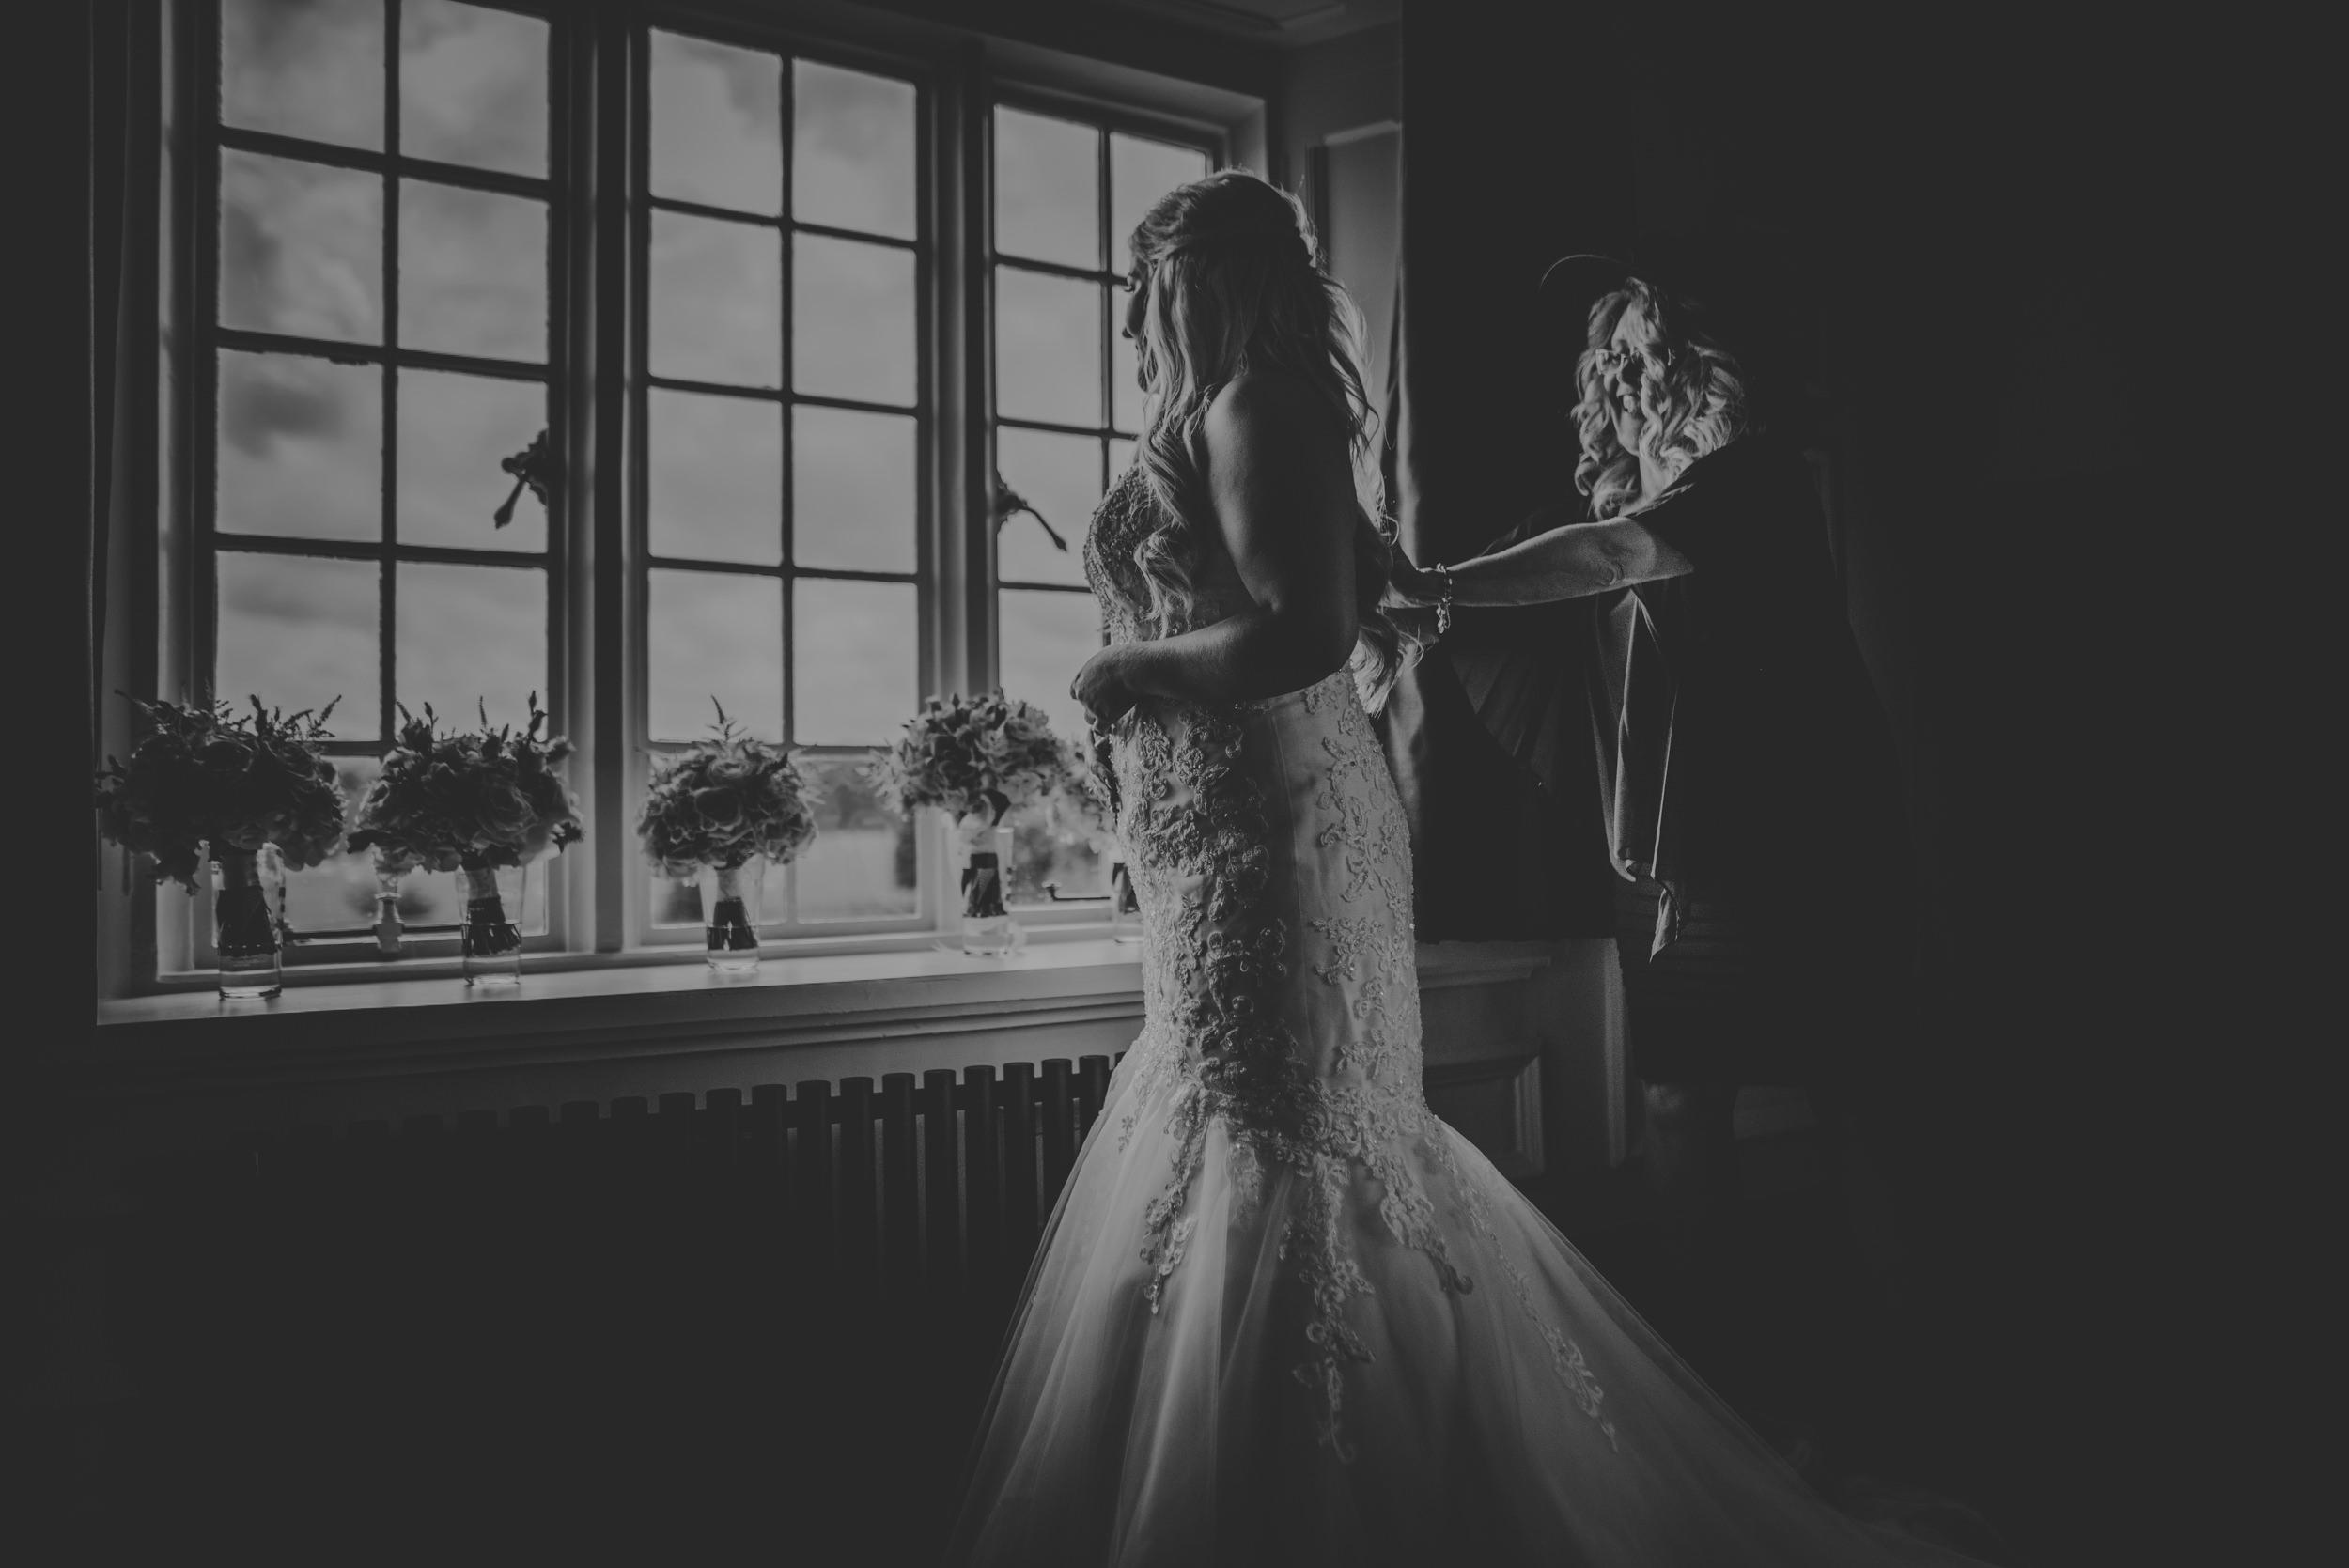 Rachel-and-James-Wedding-Horsley-Towers-State-Manu-Mendoza-Wedding-Photography-173.jpg